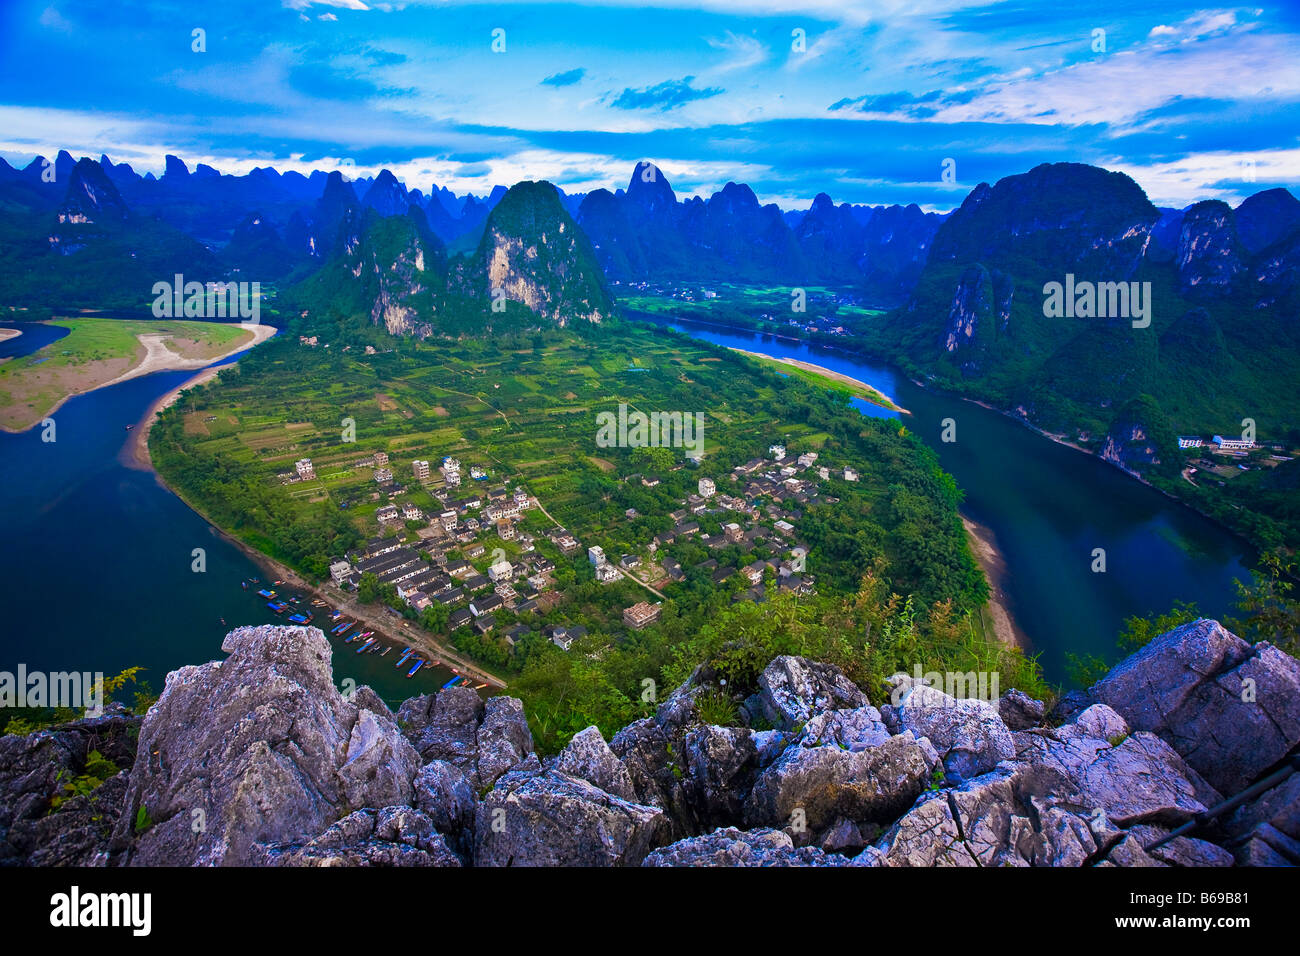 High angle view of a river passing through mountains, Li River, XingPing, Yangshuo, Guangxi Province, China - Stock Image